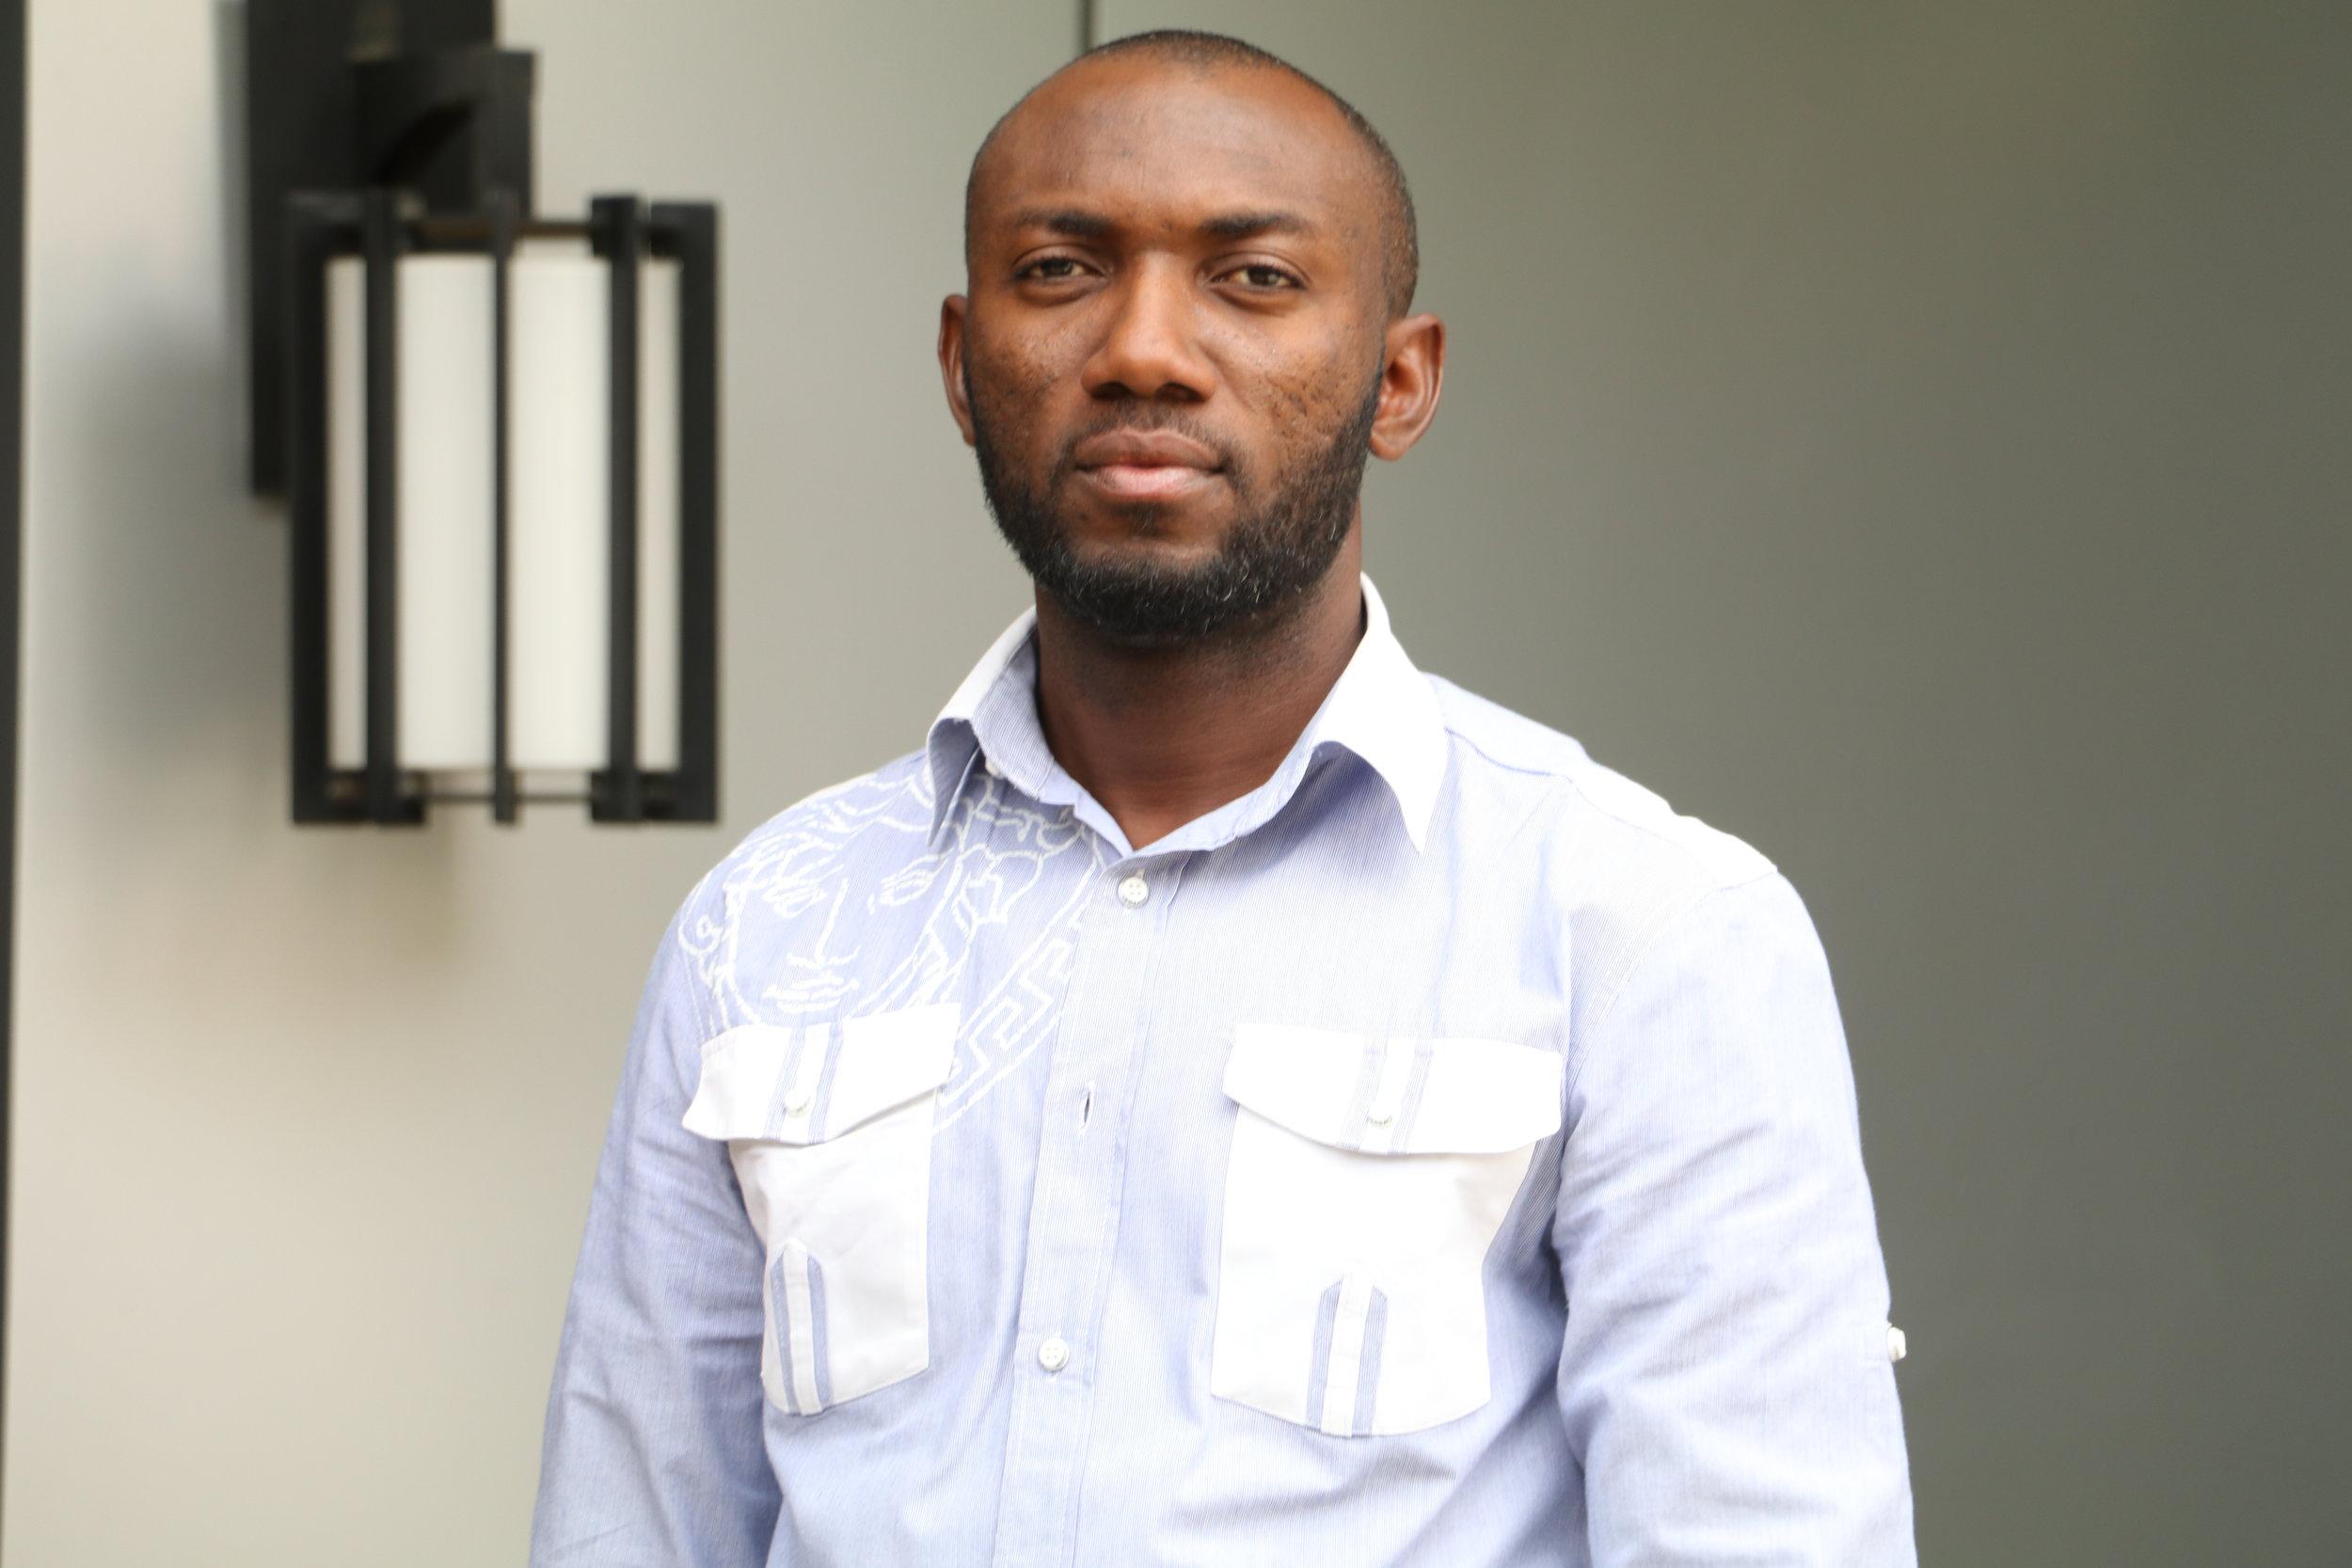 Okee Friday Enemona  Position: Finance/Admin Assistant